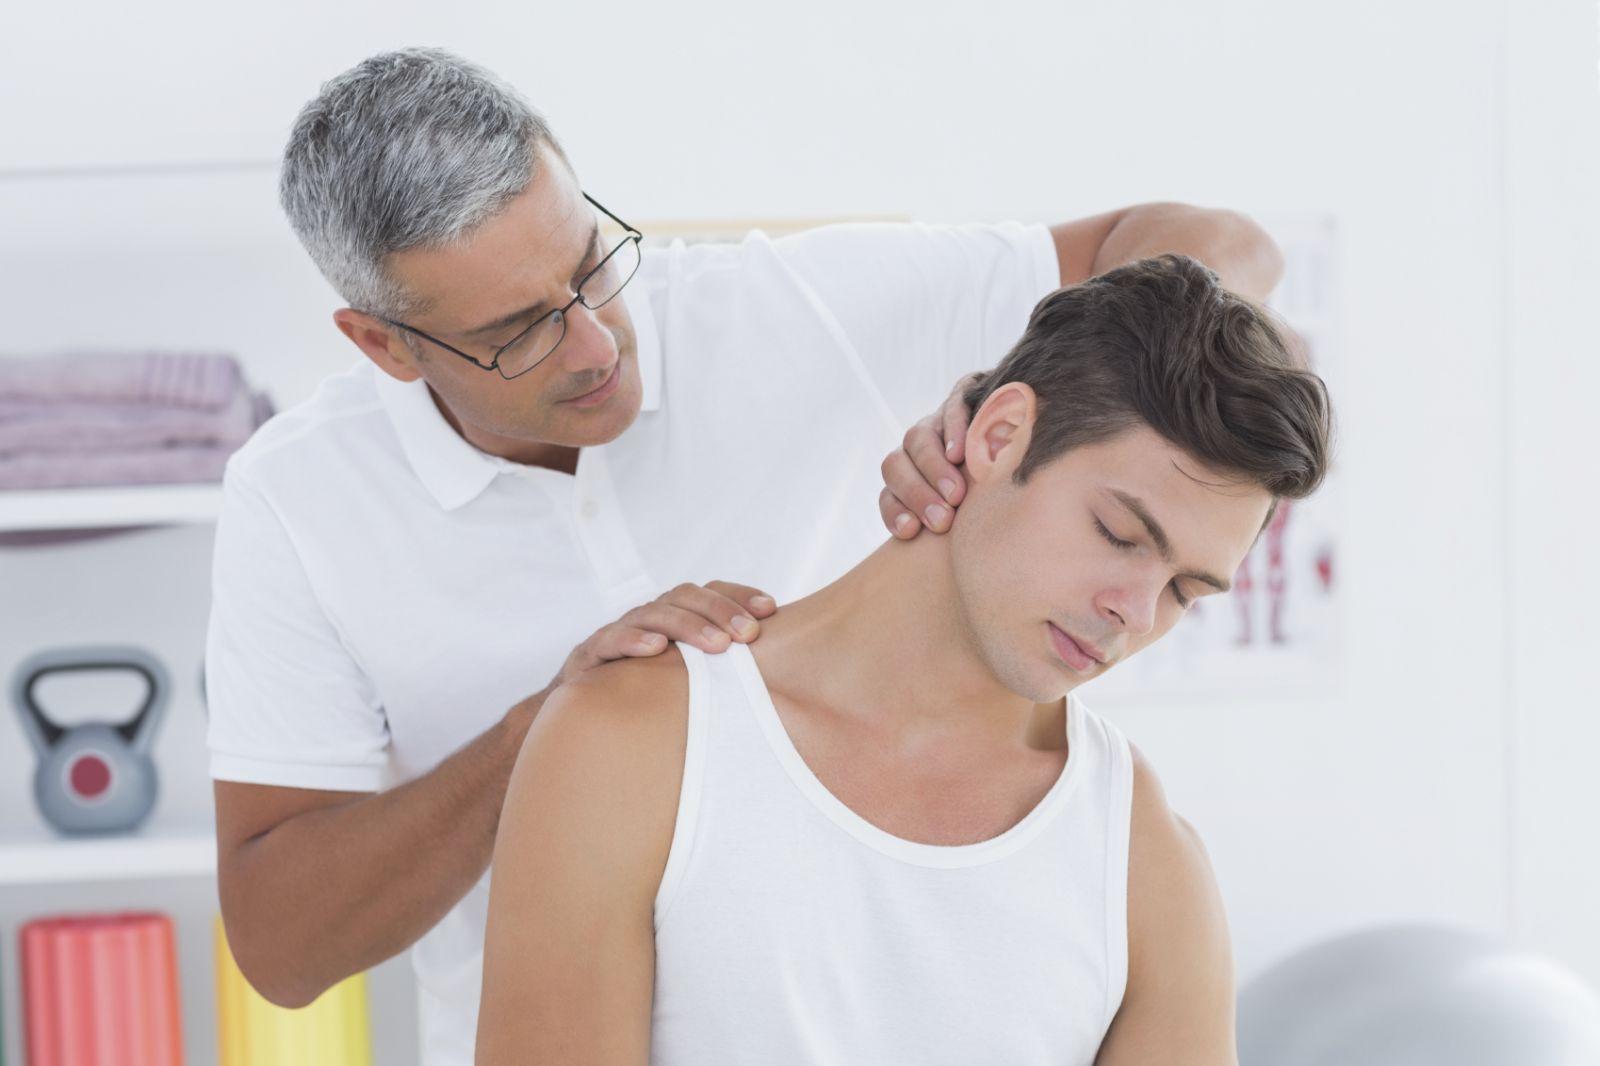 Chiropractor - Adjustment - therapist